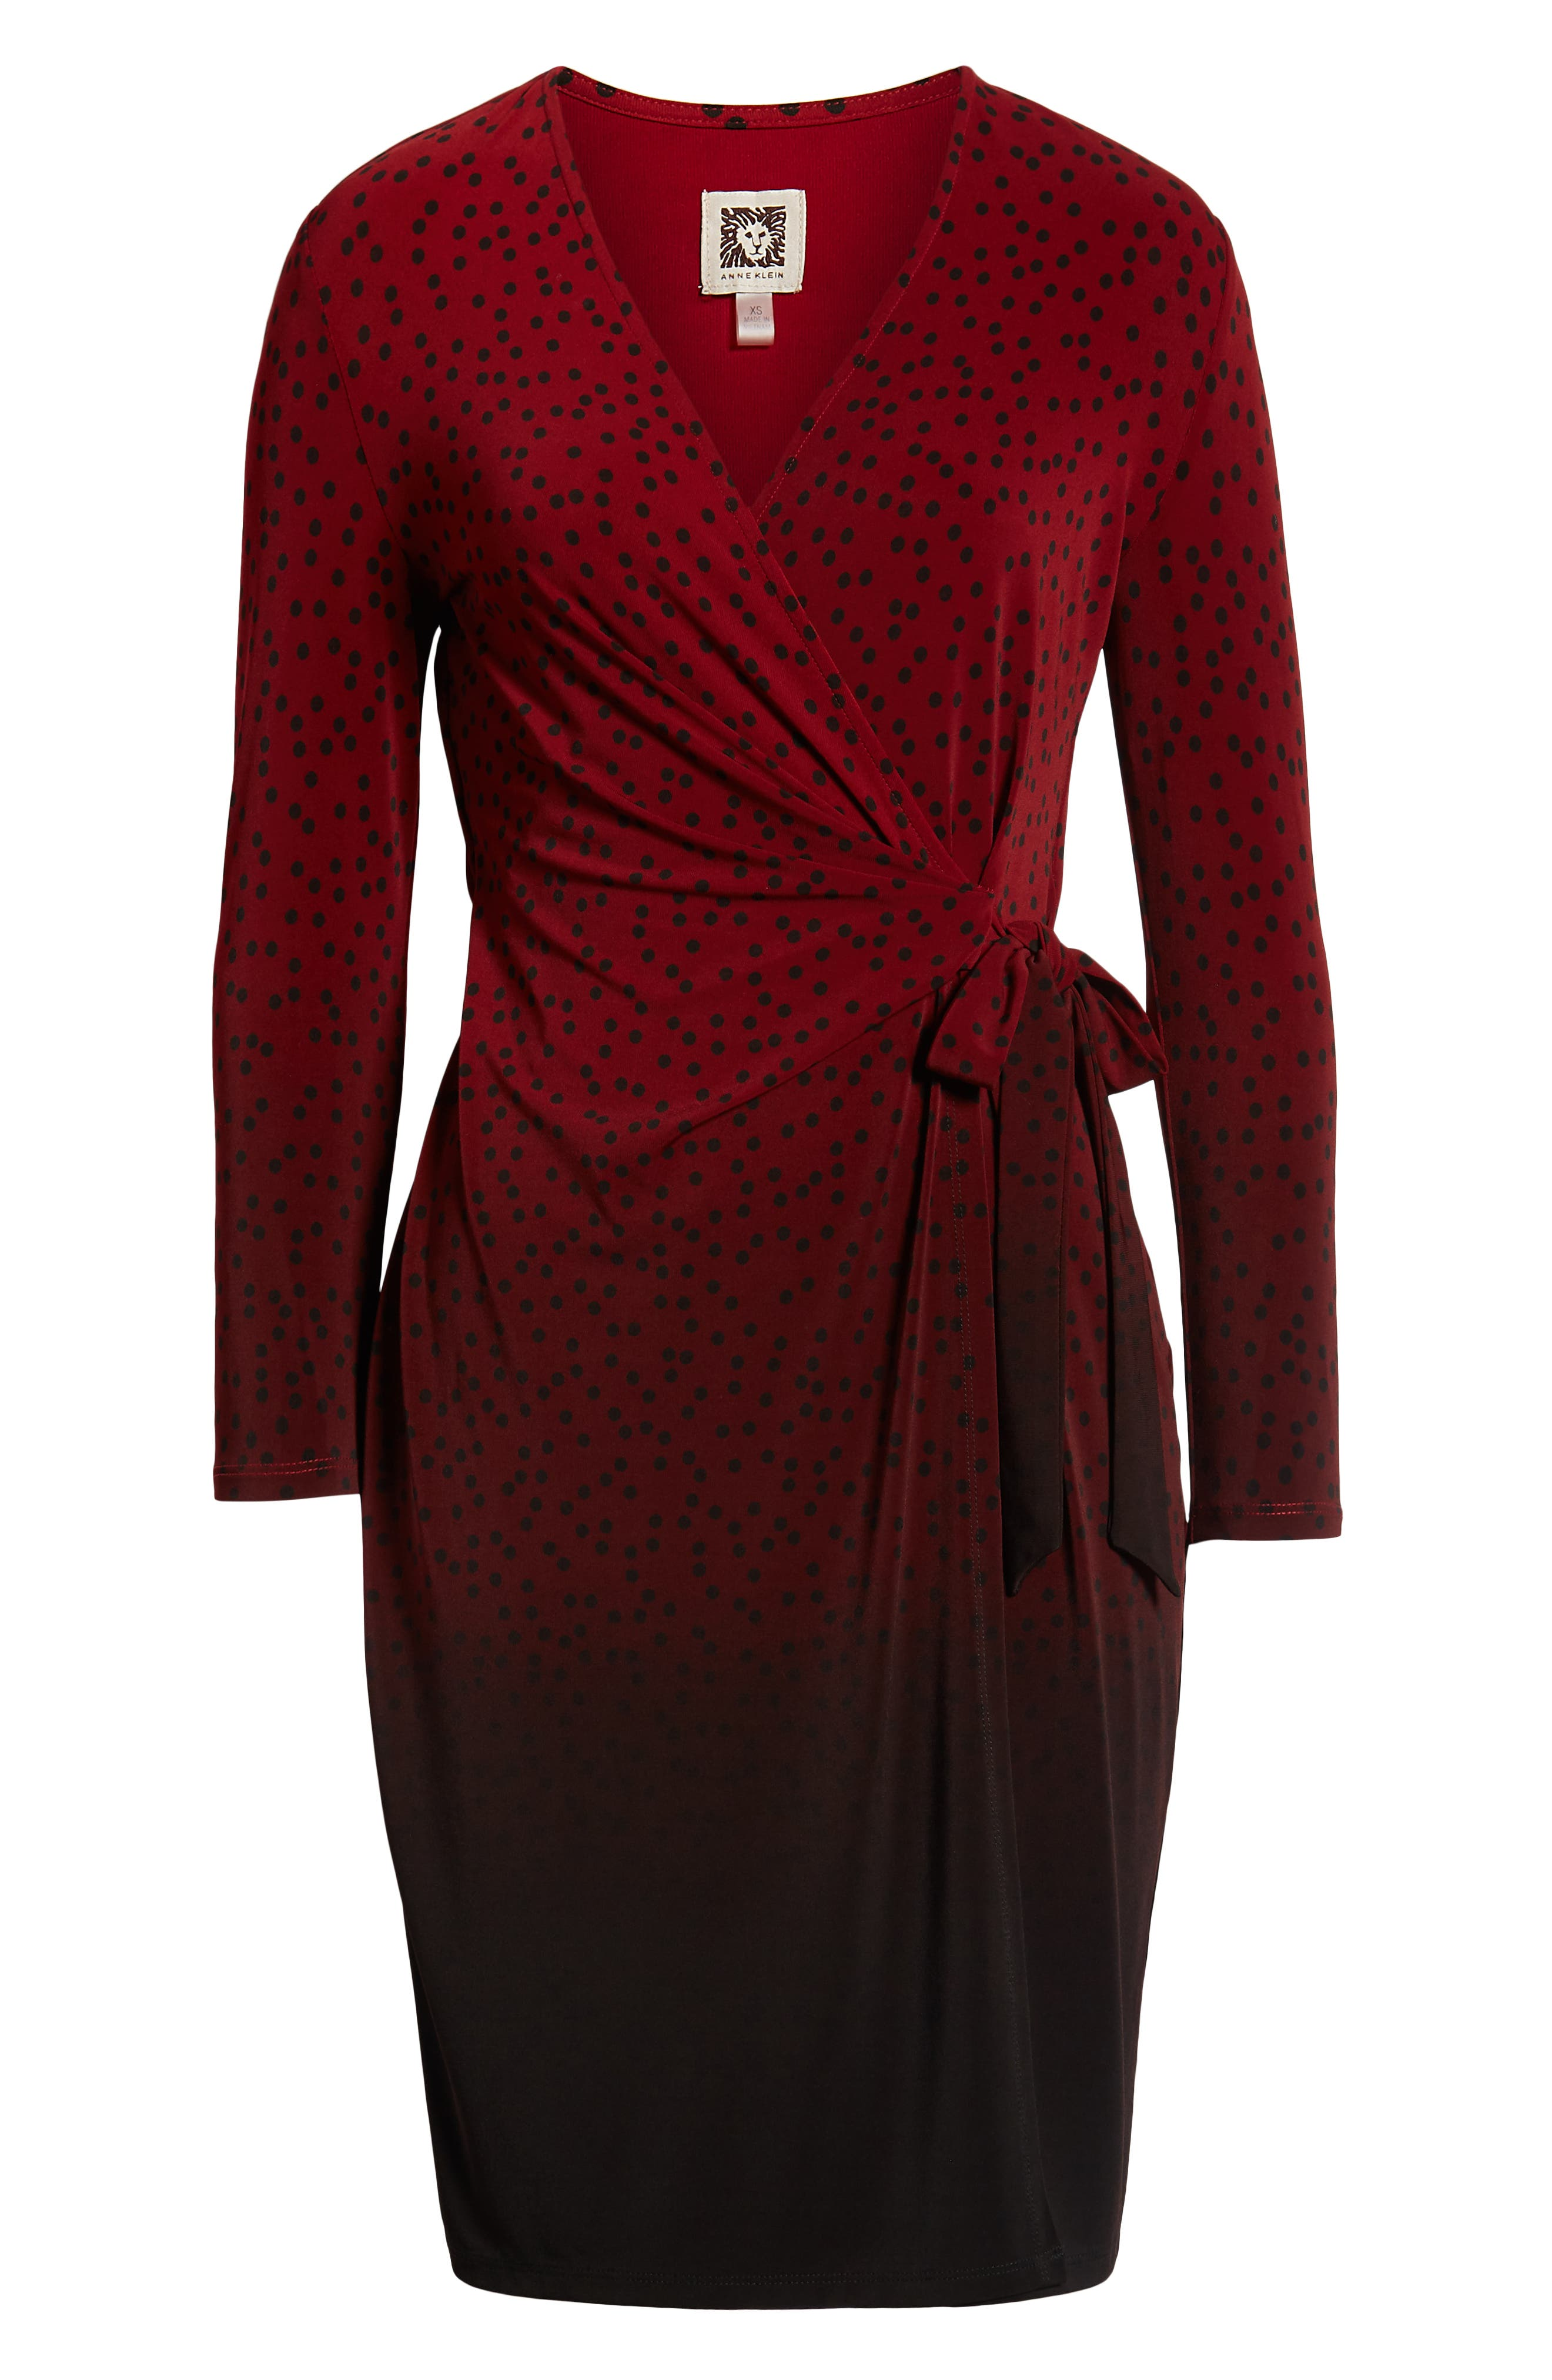 ANNE KLEIN,                             Camille Dot Faux Wrap Dress,                             Alternate thumbnail 7, color,                             DK TITIAN RED/ ANNE BLK COMBO